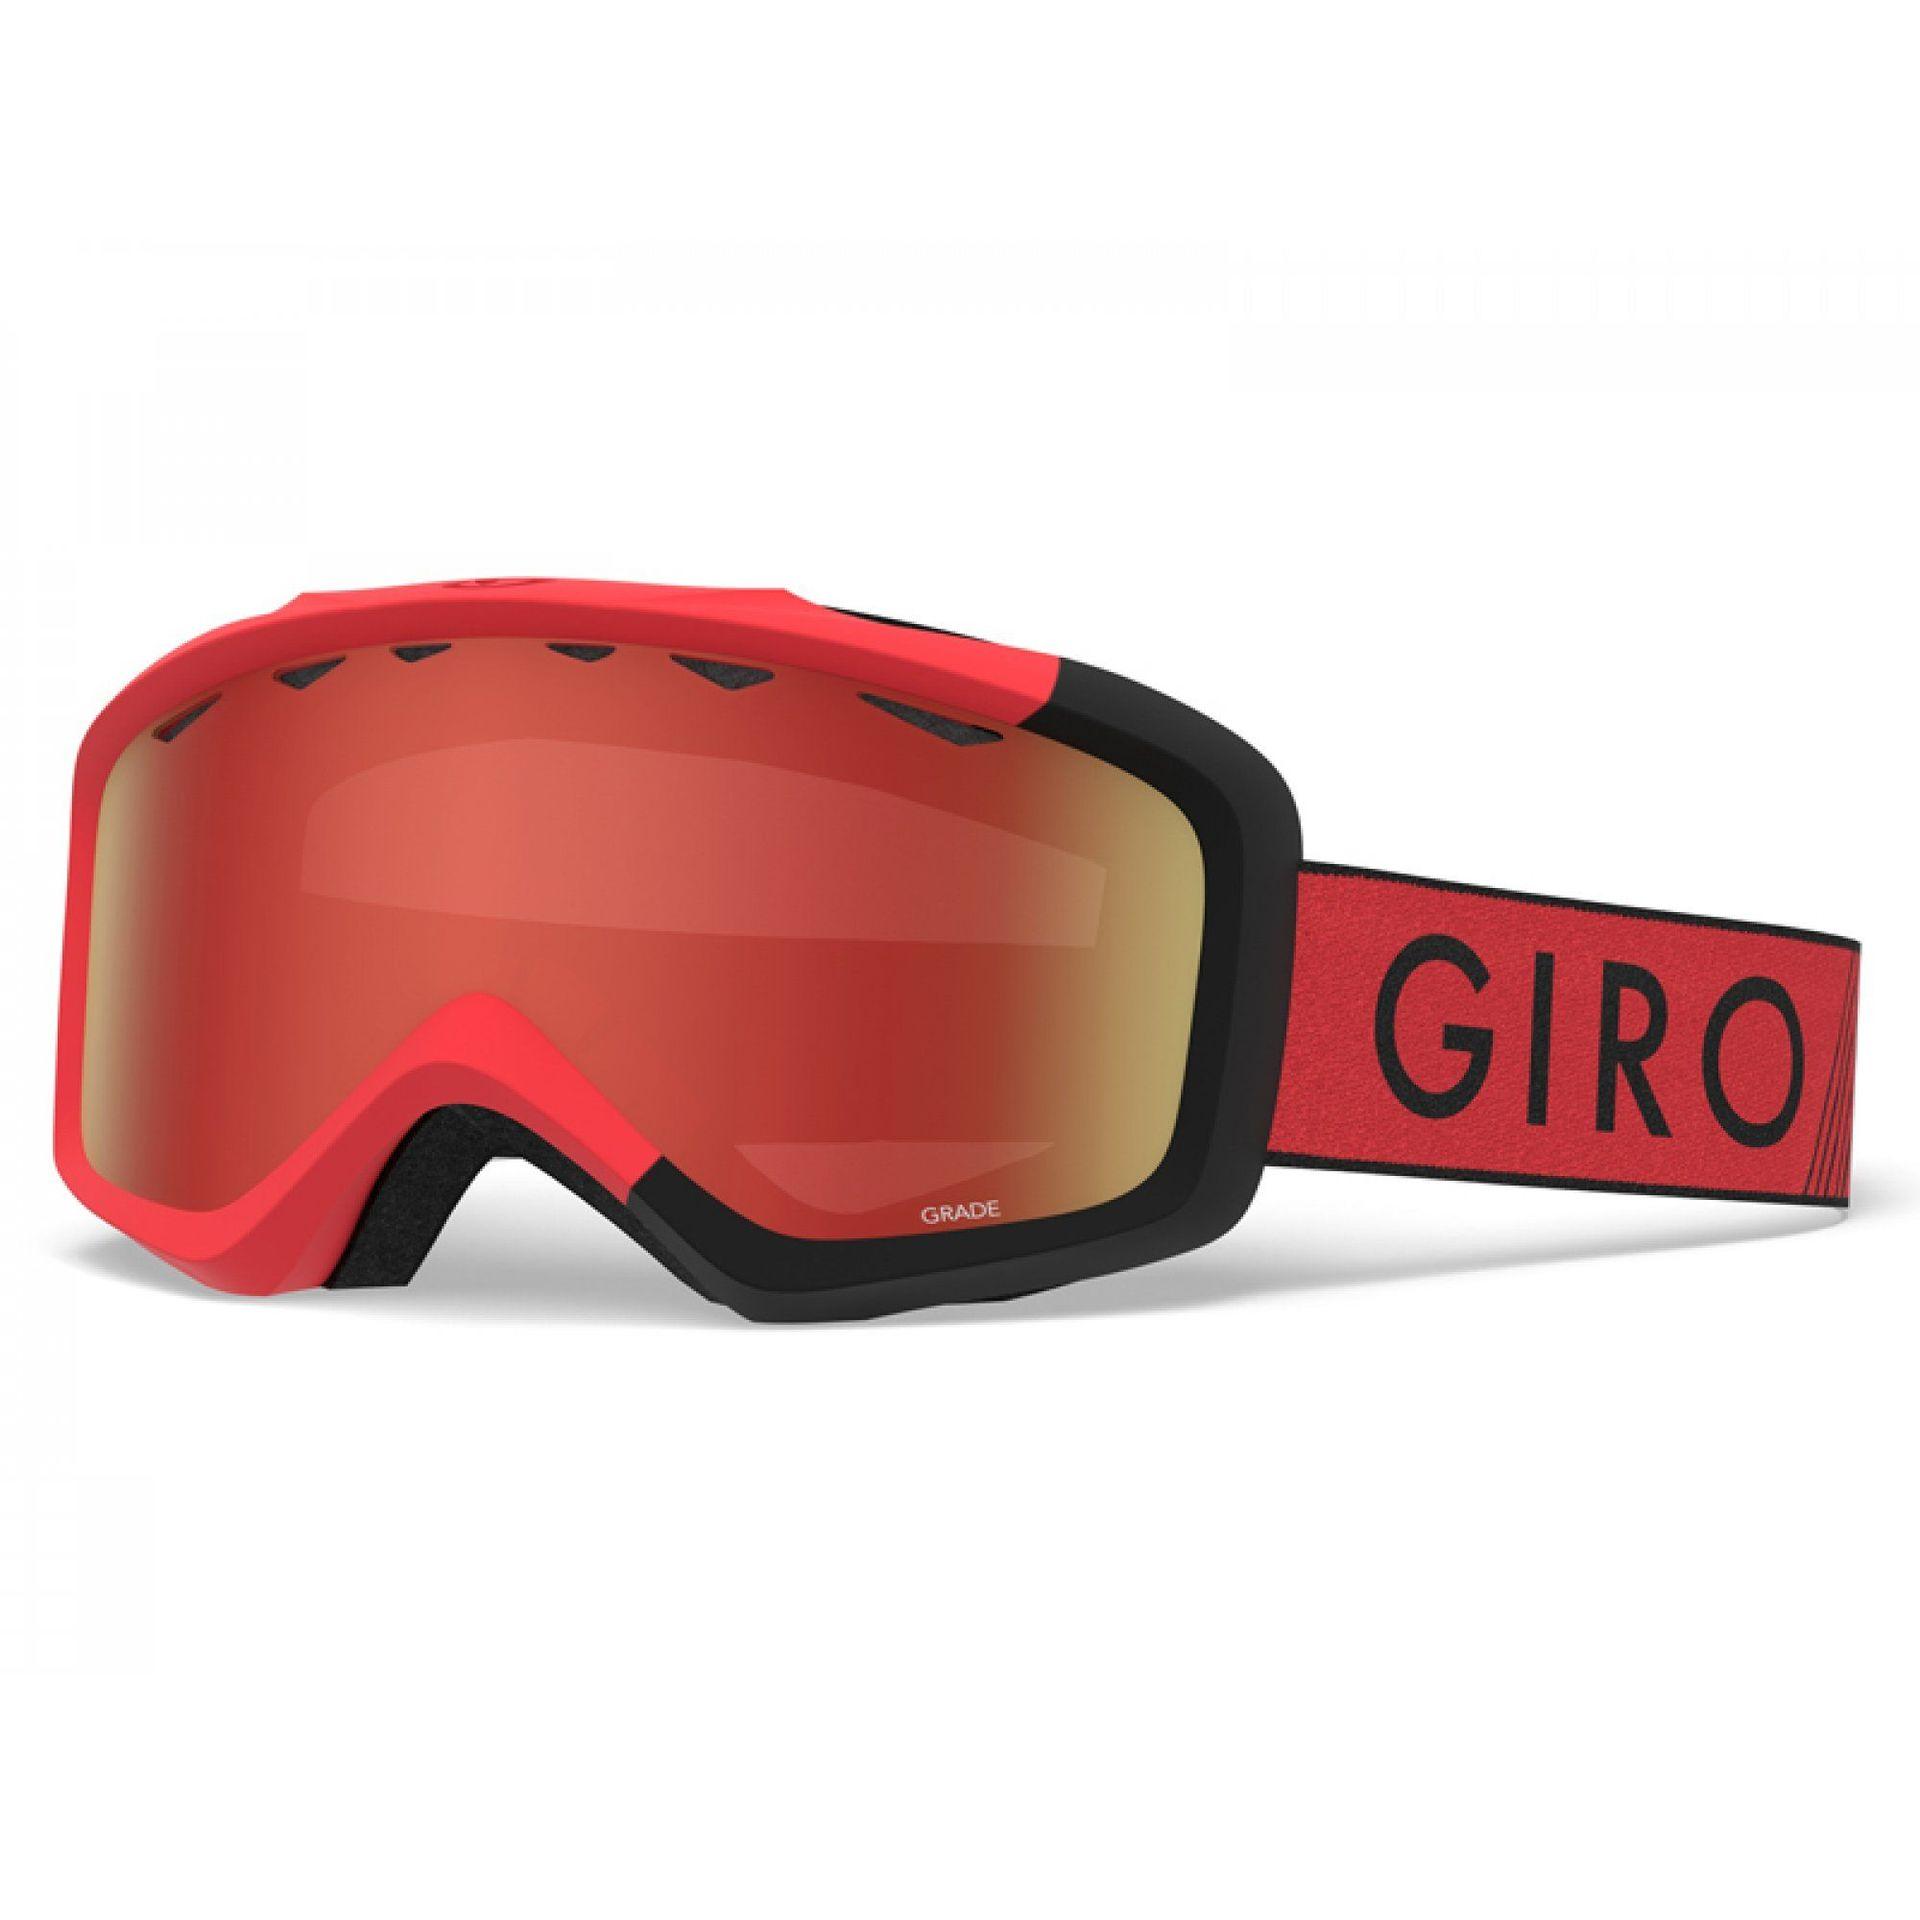 GOGLE GIRO GRADE RED BLACK ZOOM|AMBER SCARLET 1